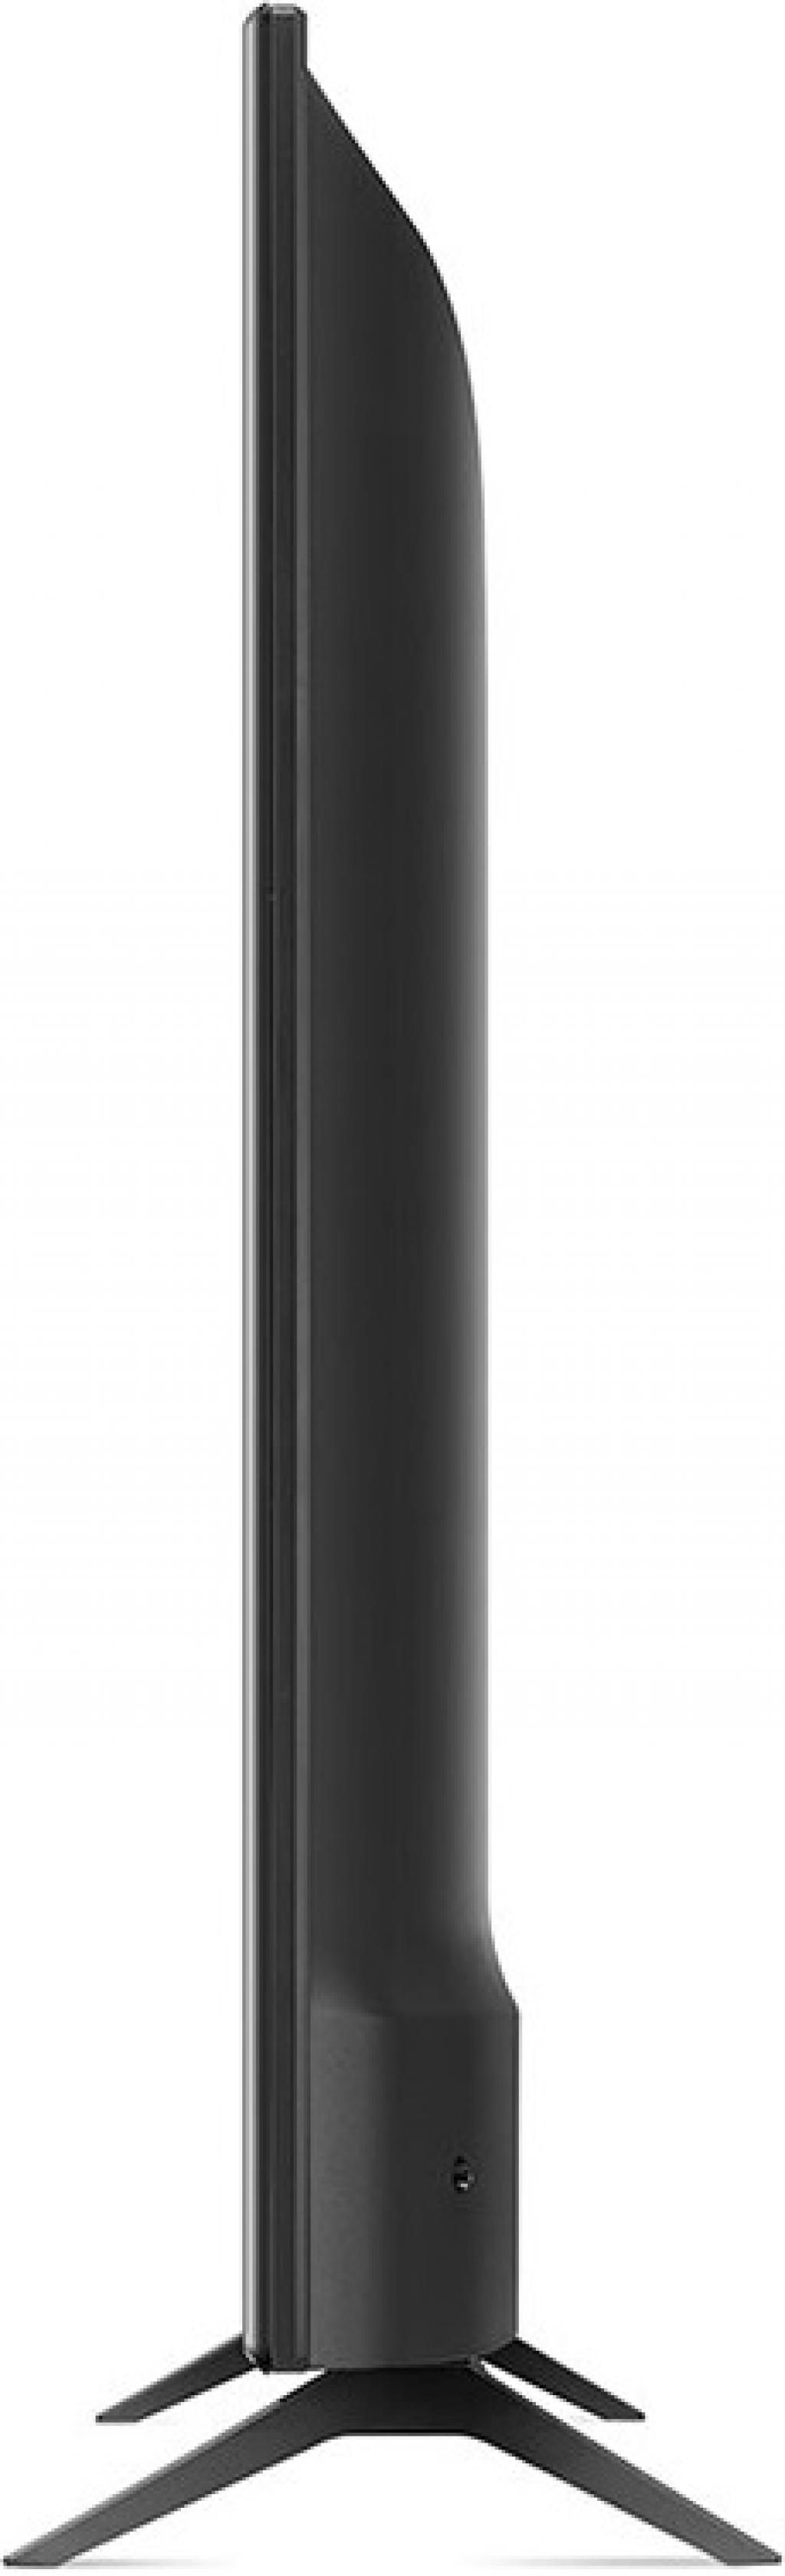 Телевизор LG LED 60UN71003LB